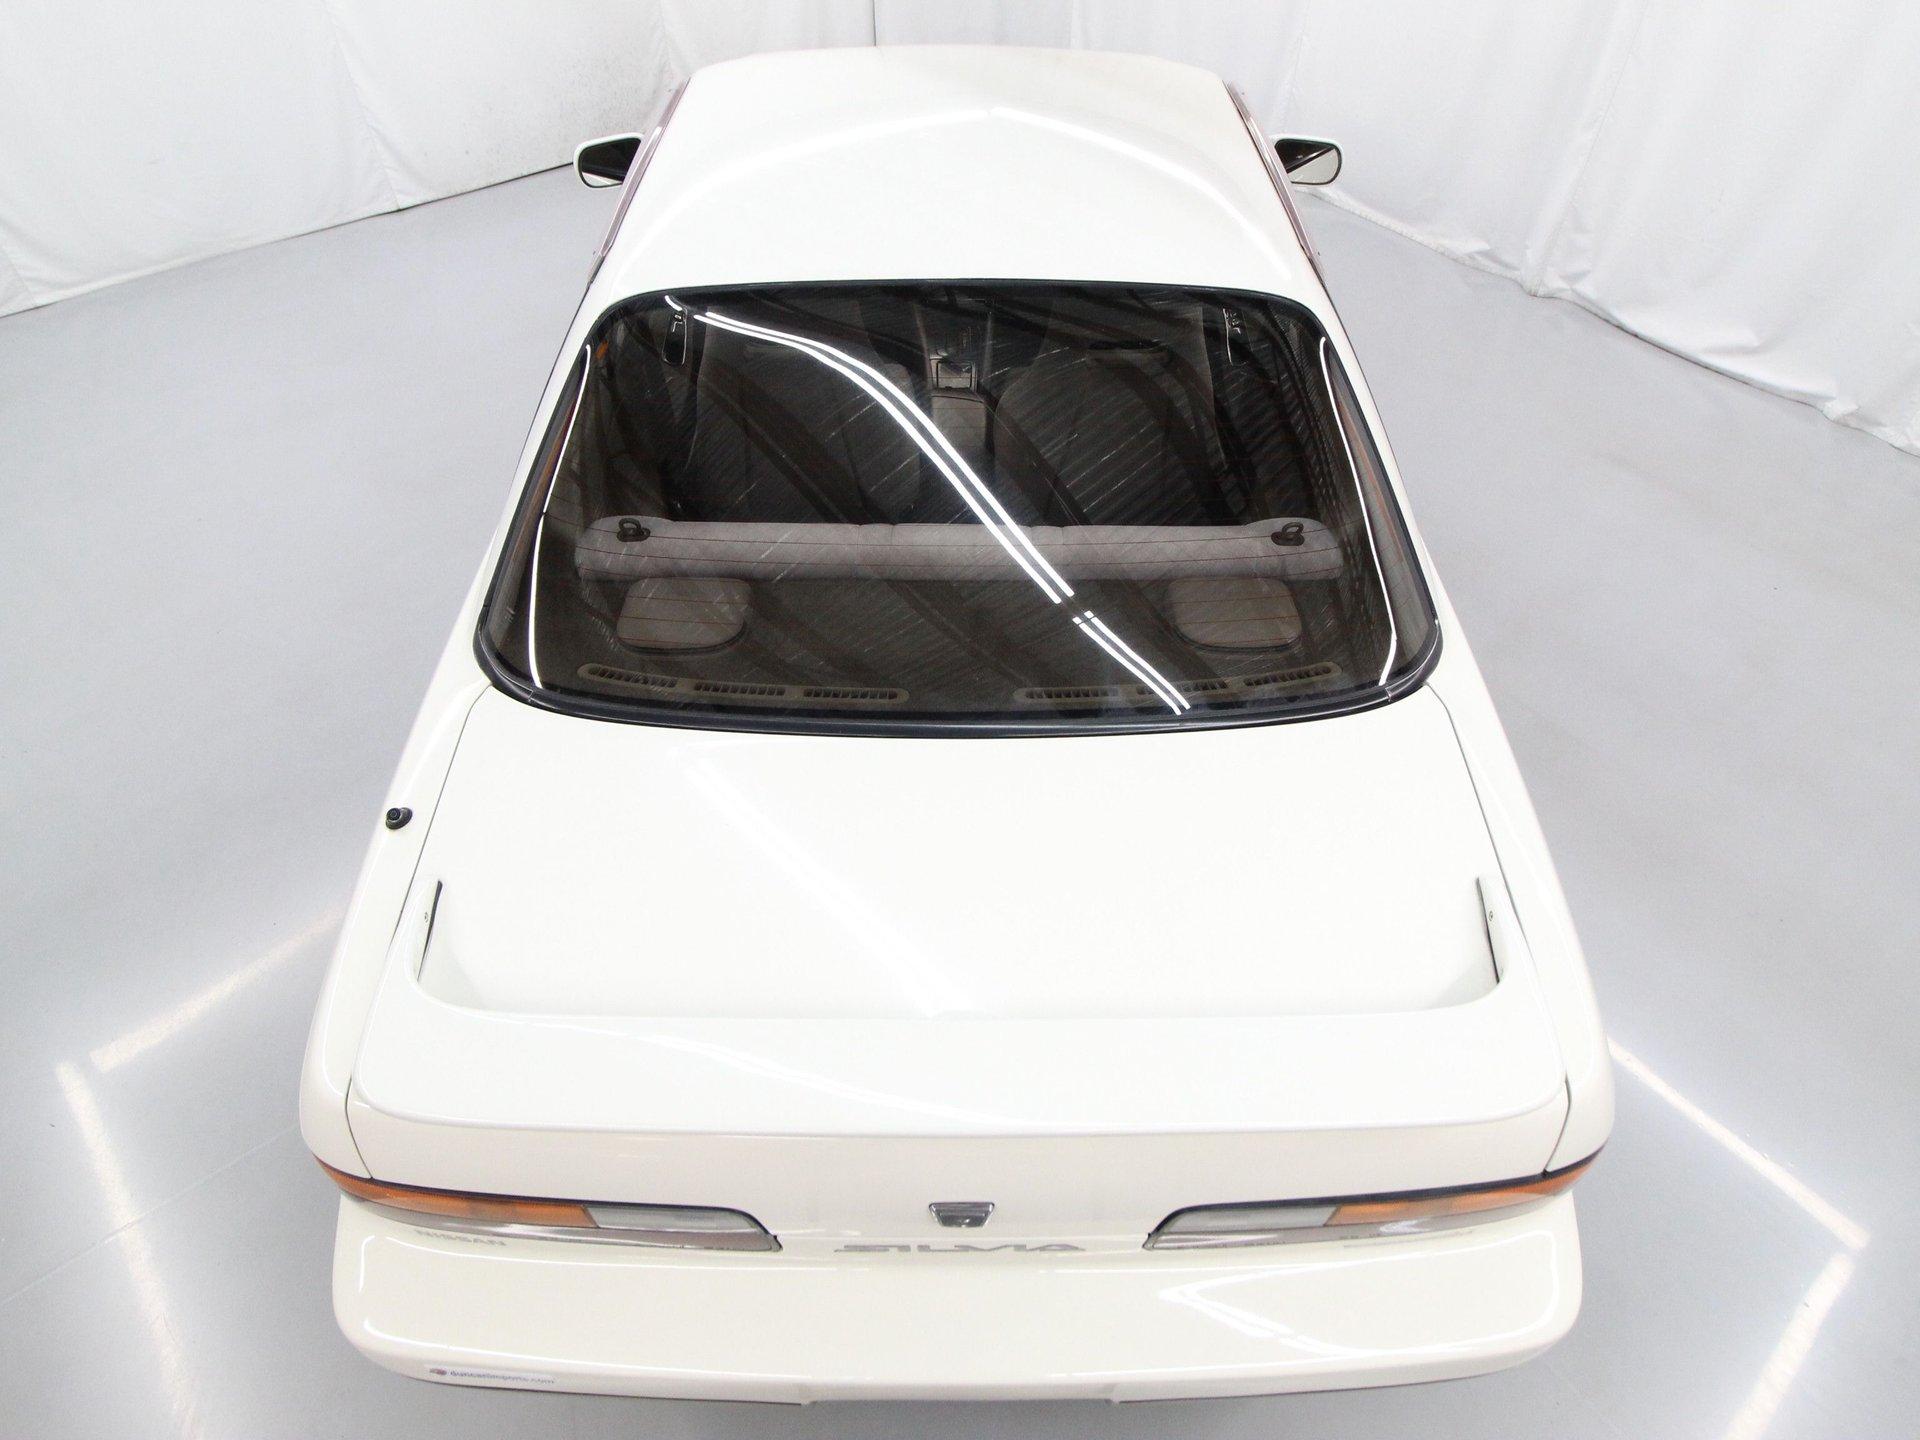 1989 Nissan Silvia